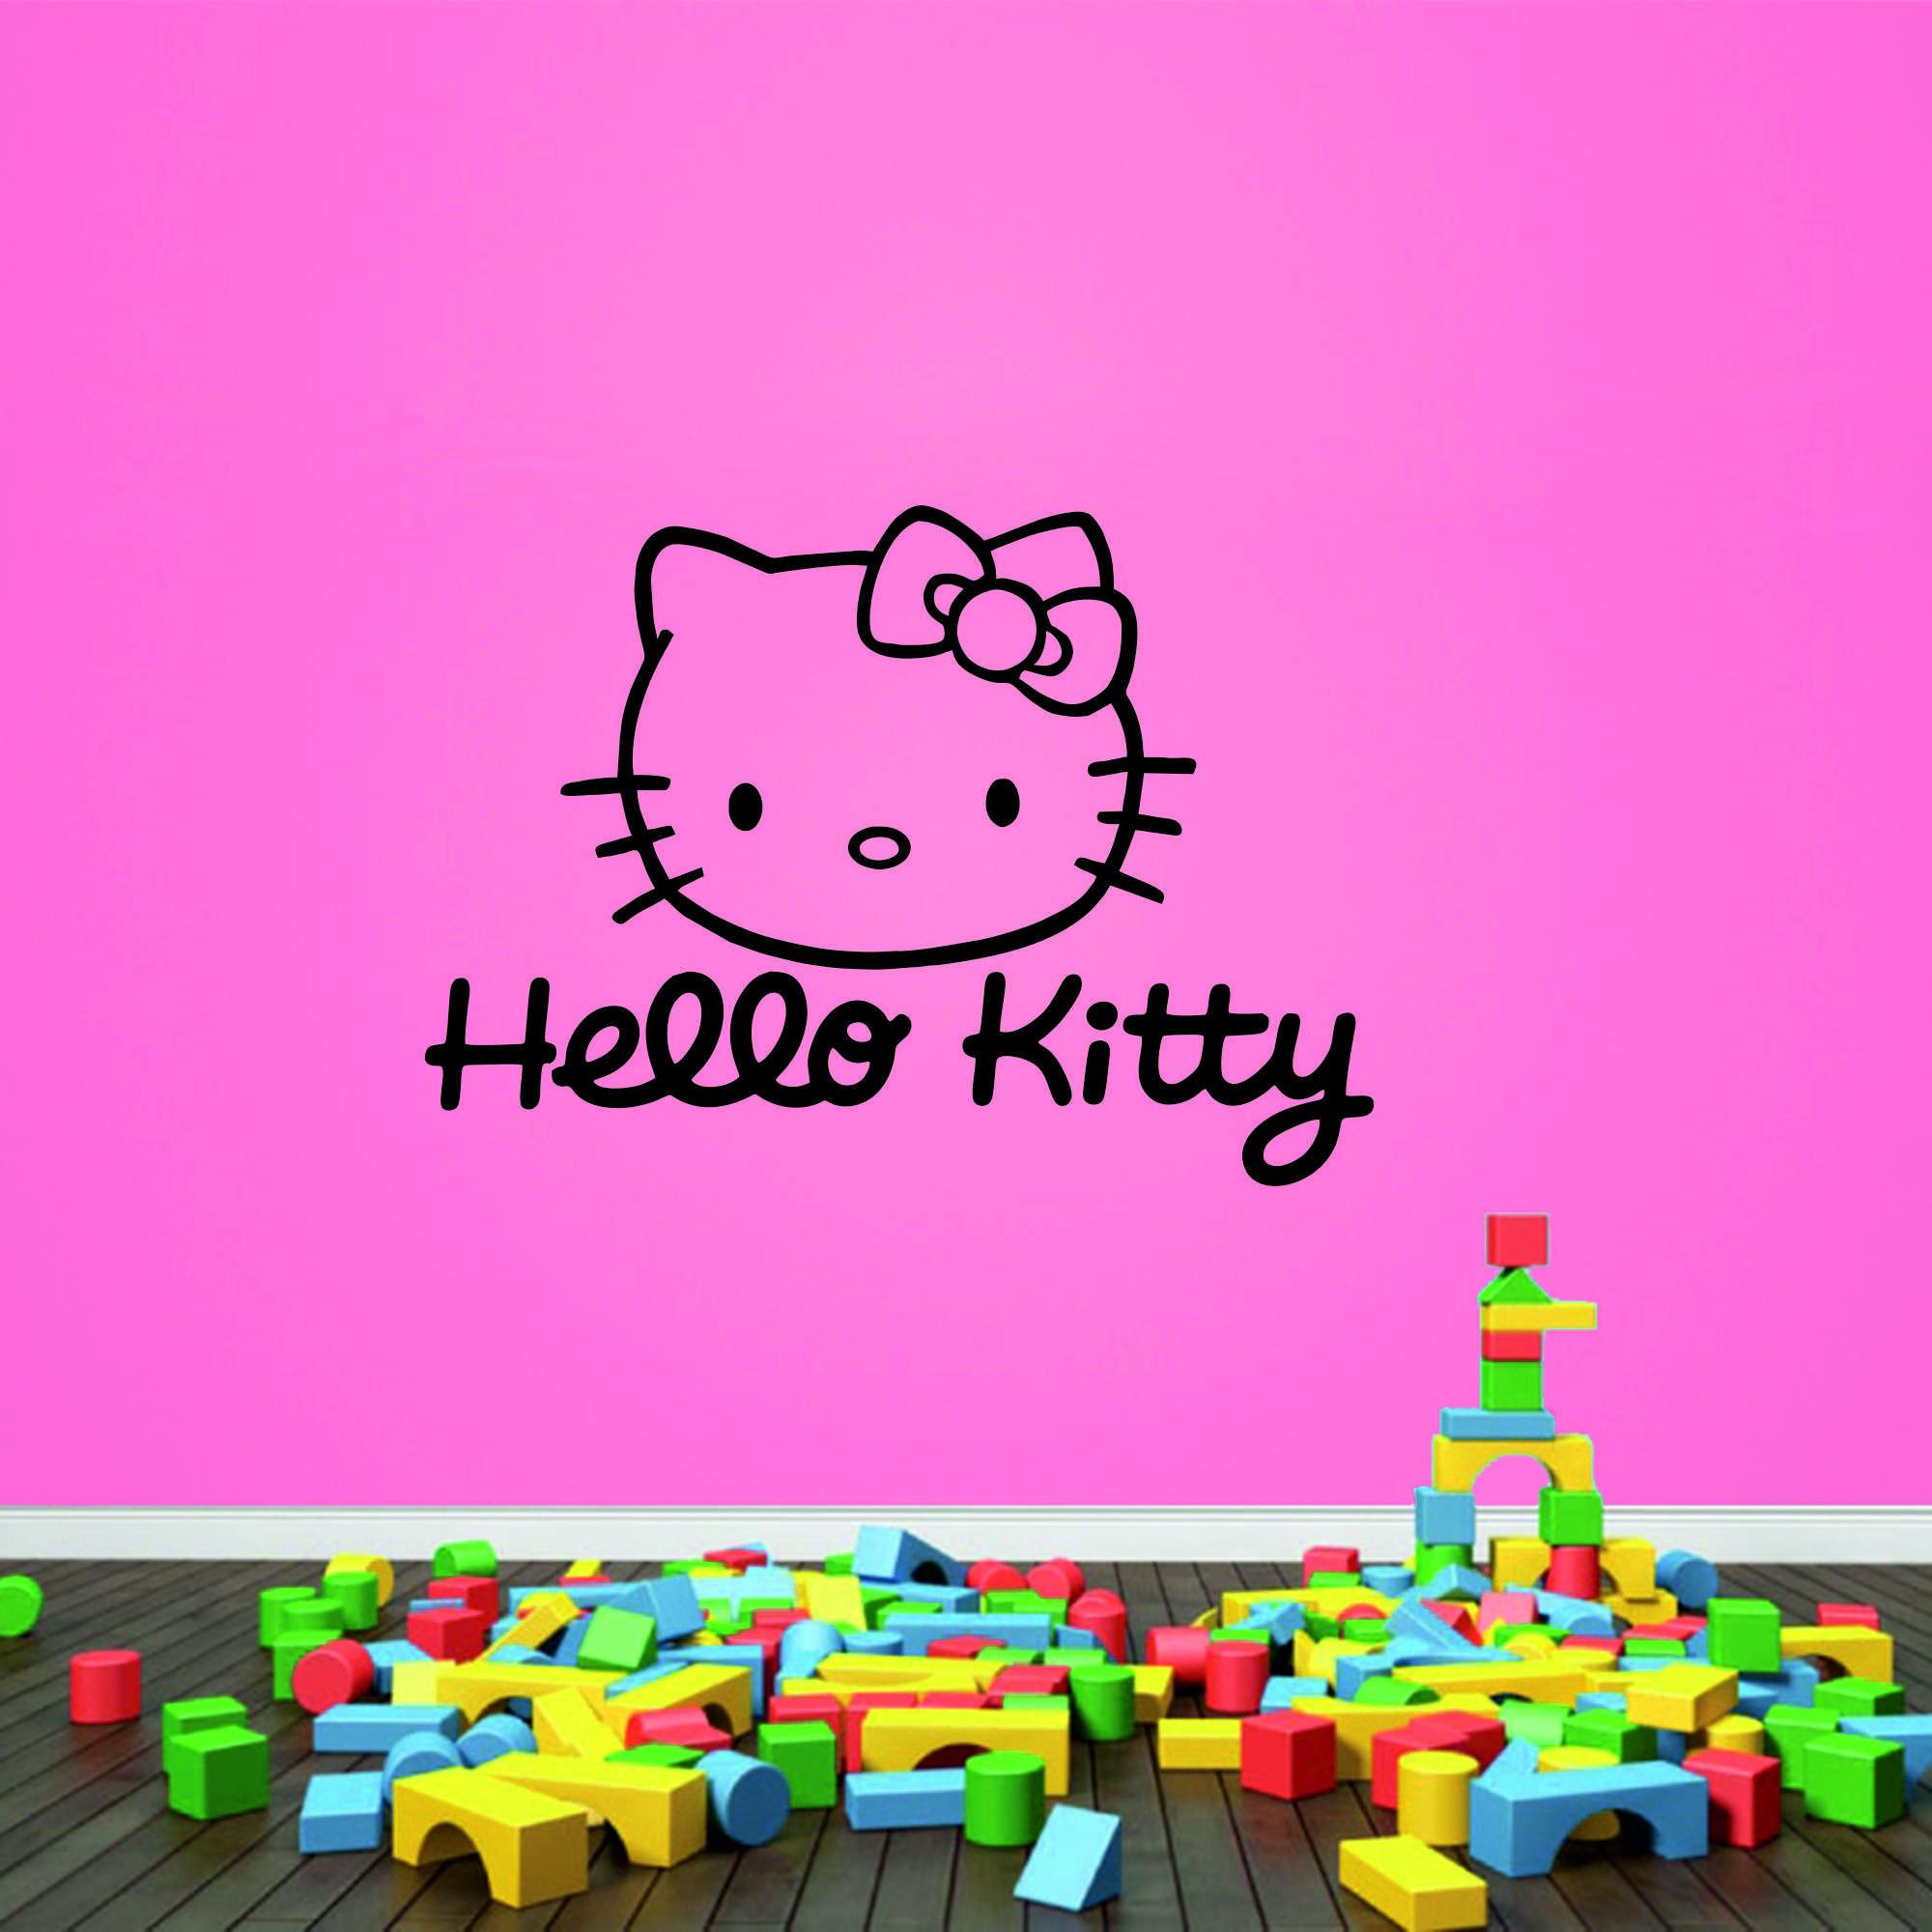 Samolepka na zeď - Hello Kitty 2 - 60x43 cm - PopyDesign